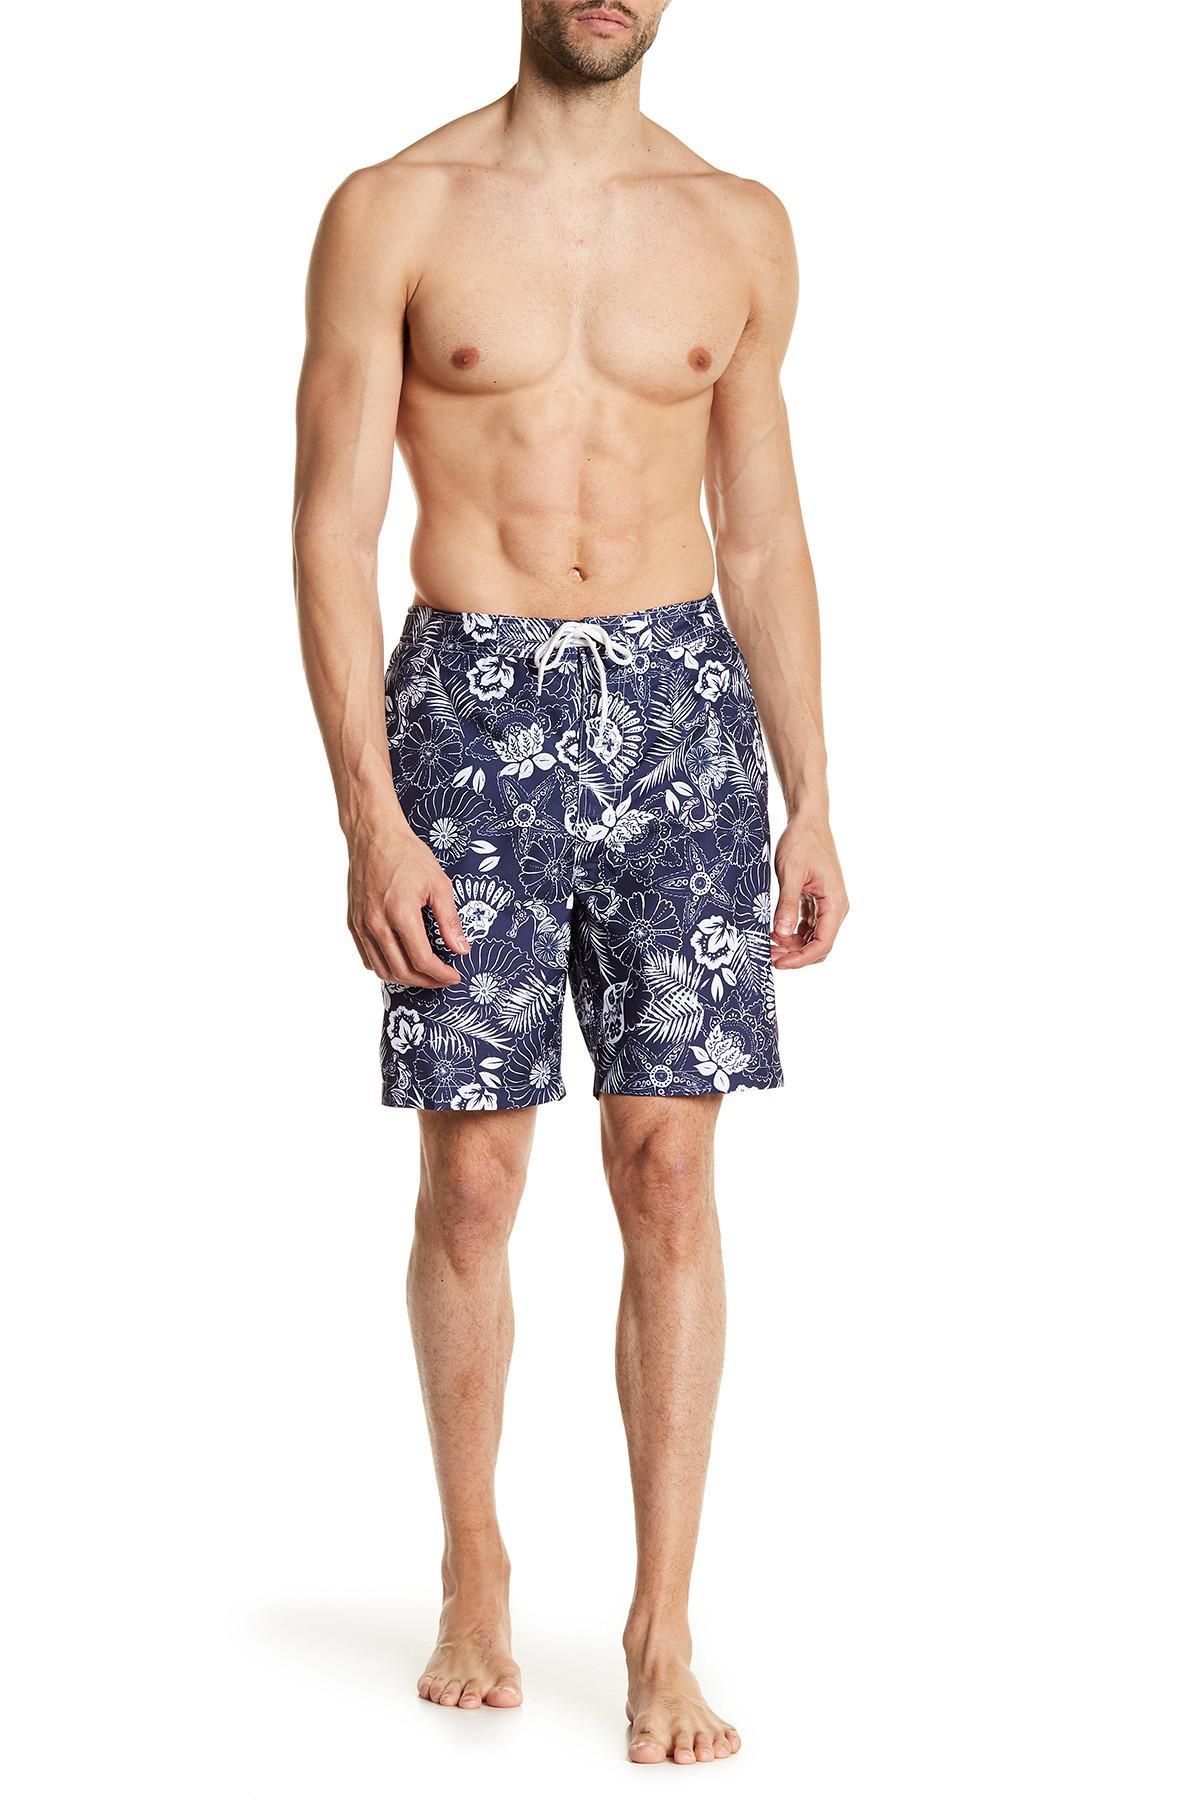 366f22dfe8 Lyst - Trunks Surf And Swim Co Swami Seashell Paisley Swim Trunks in ...